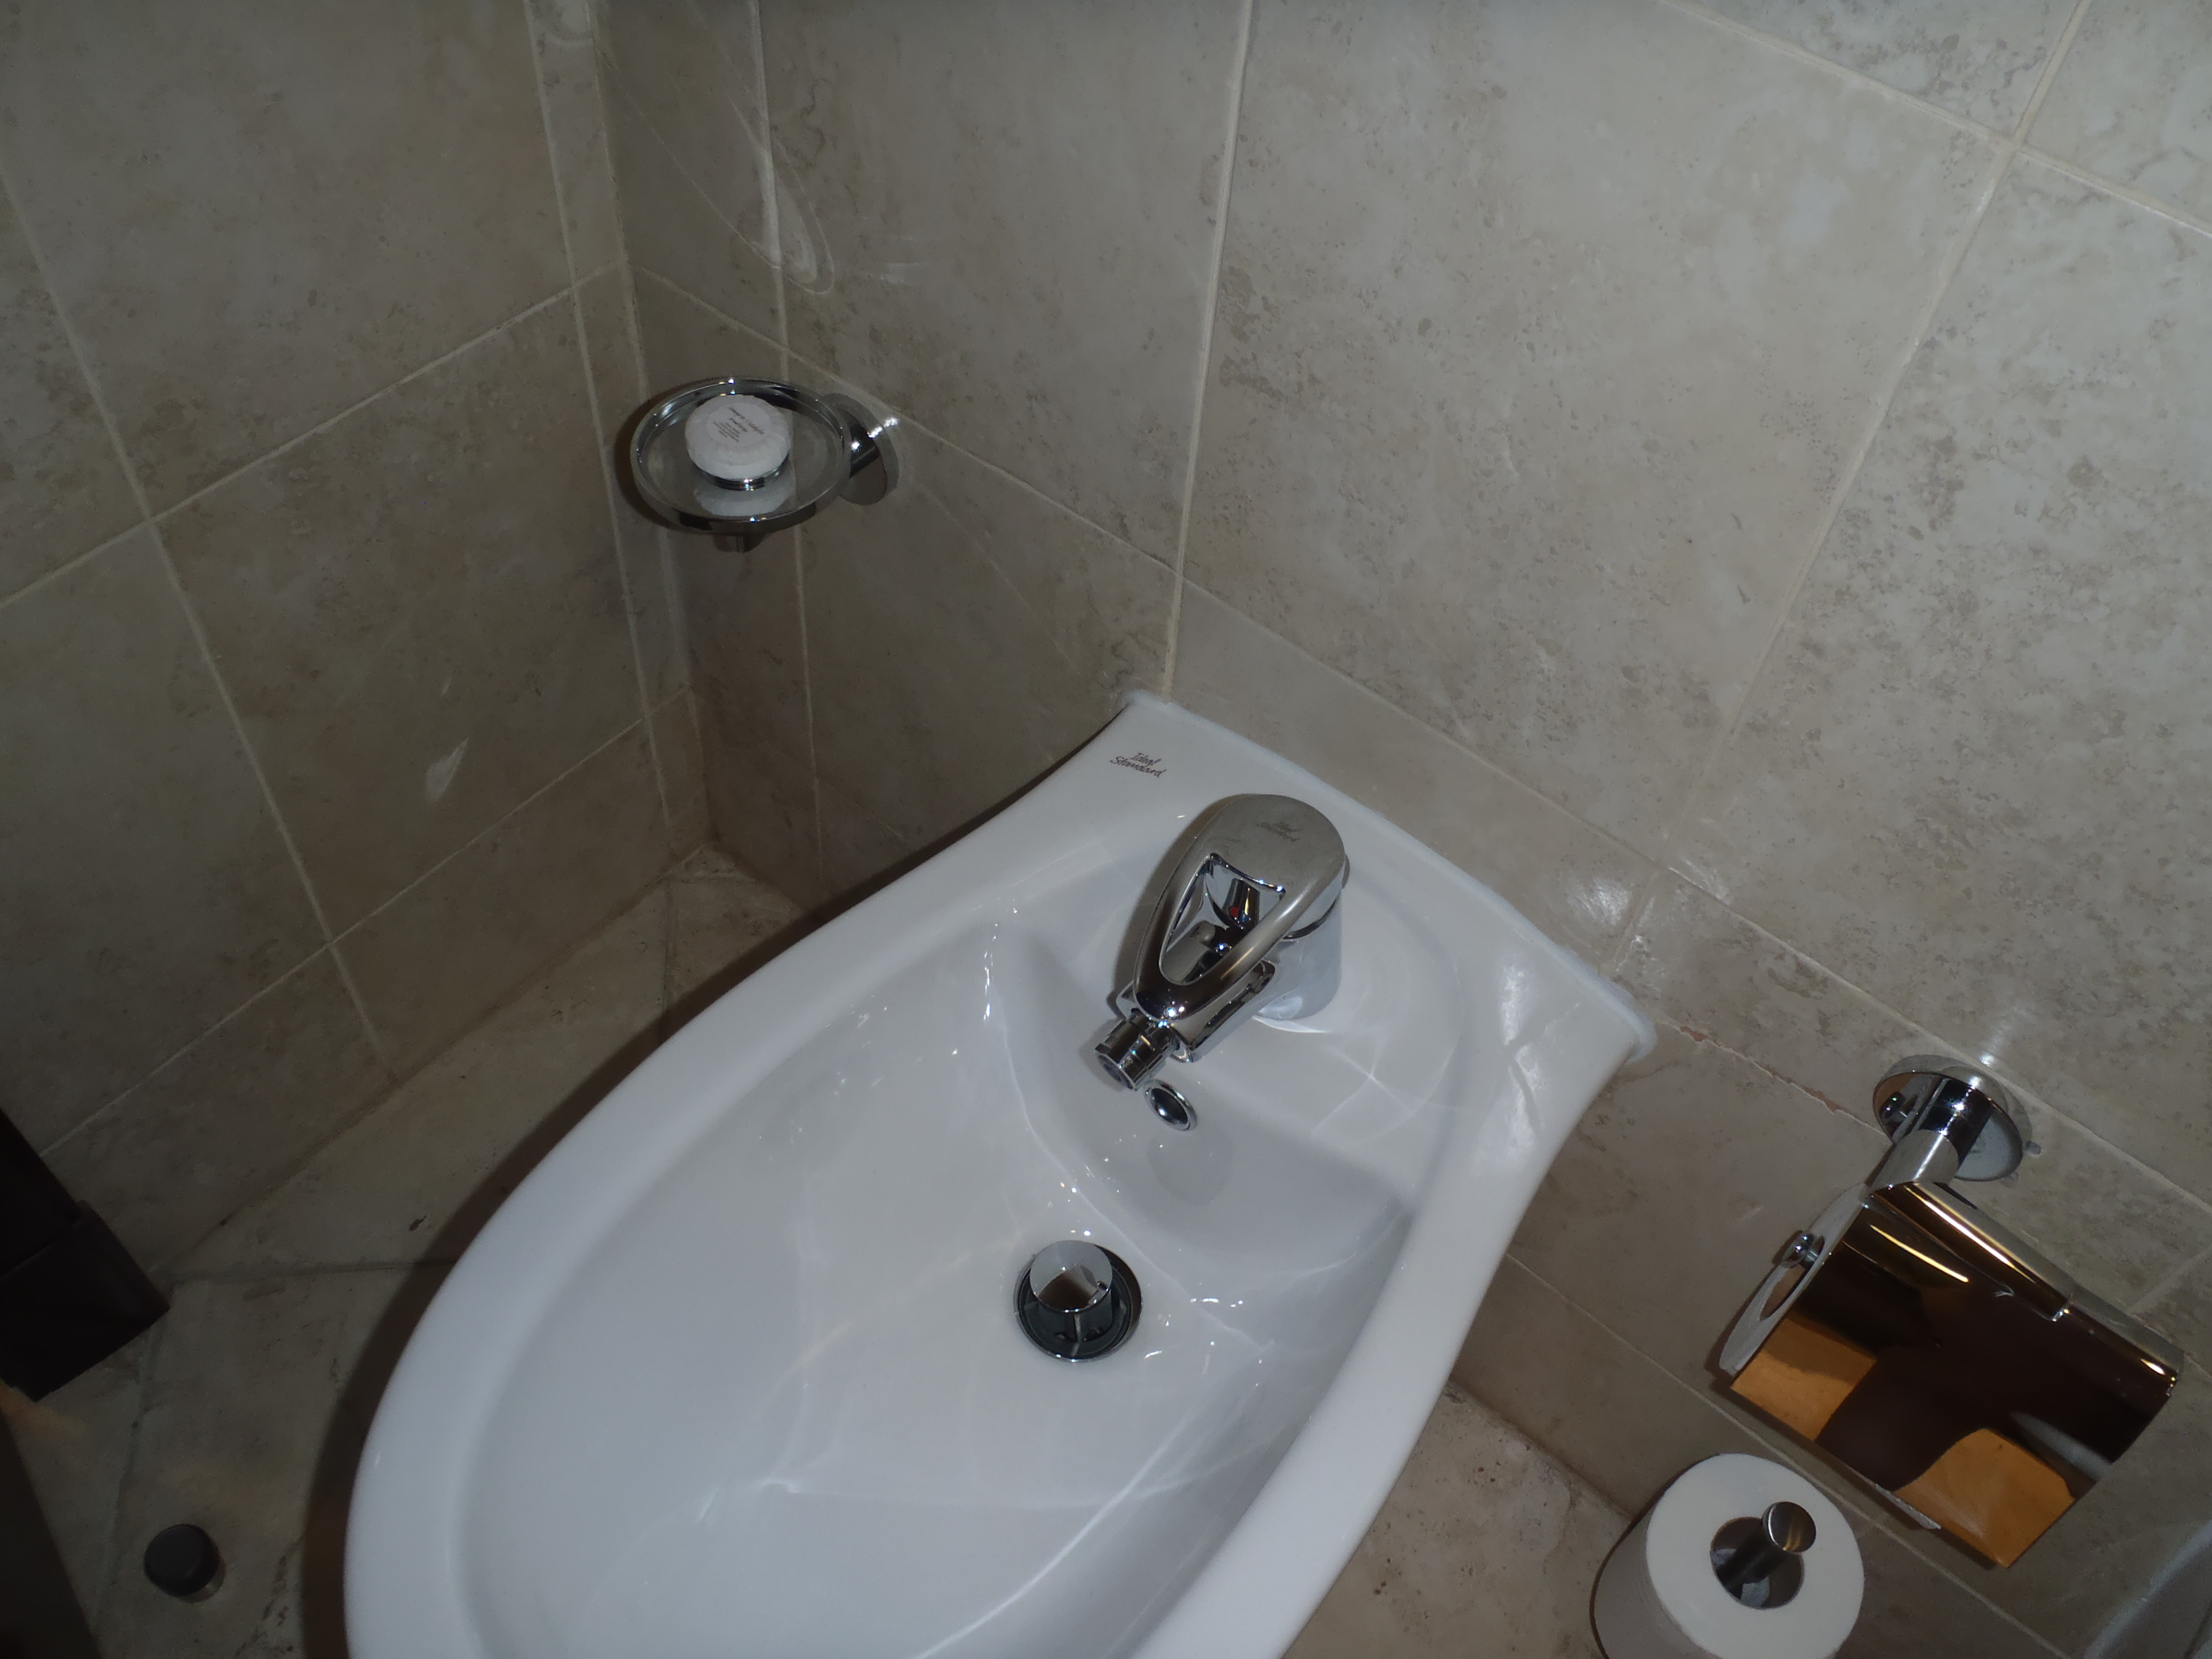 Bathroom cameras man who hid camera in sherwood starbucks